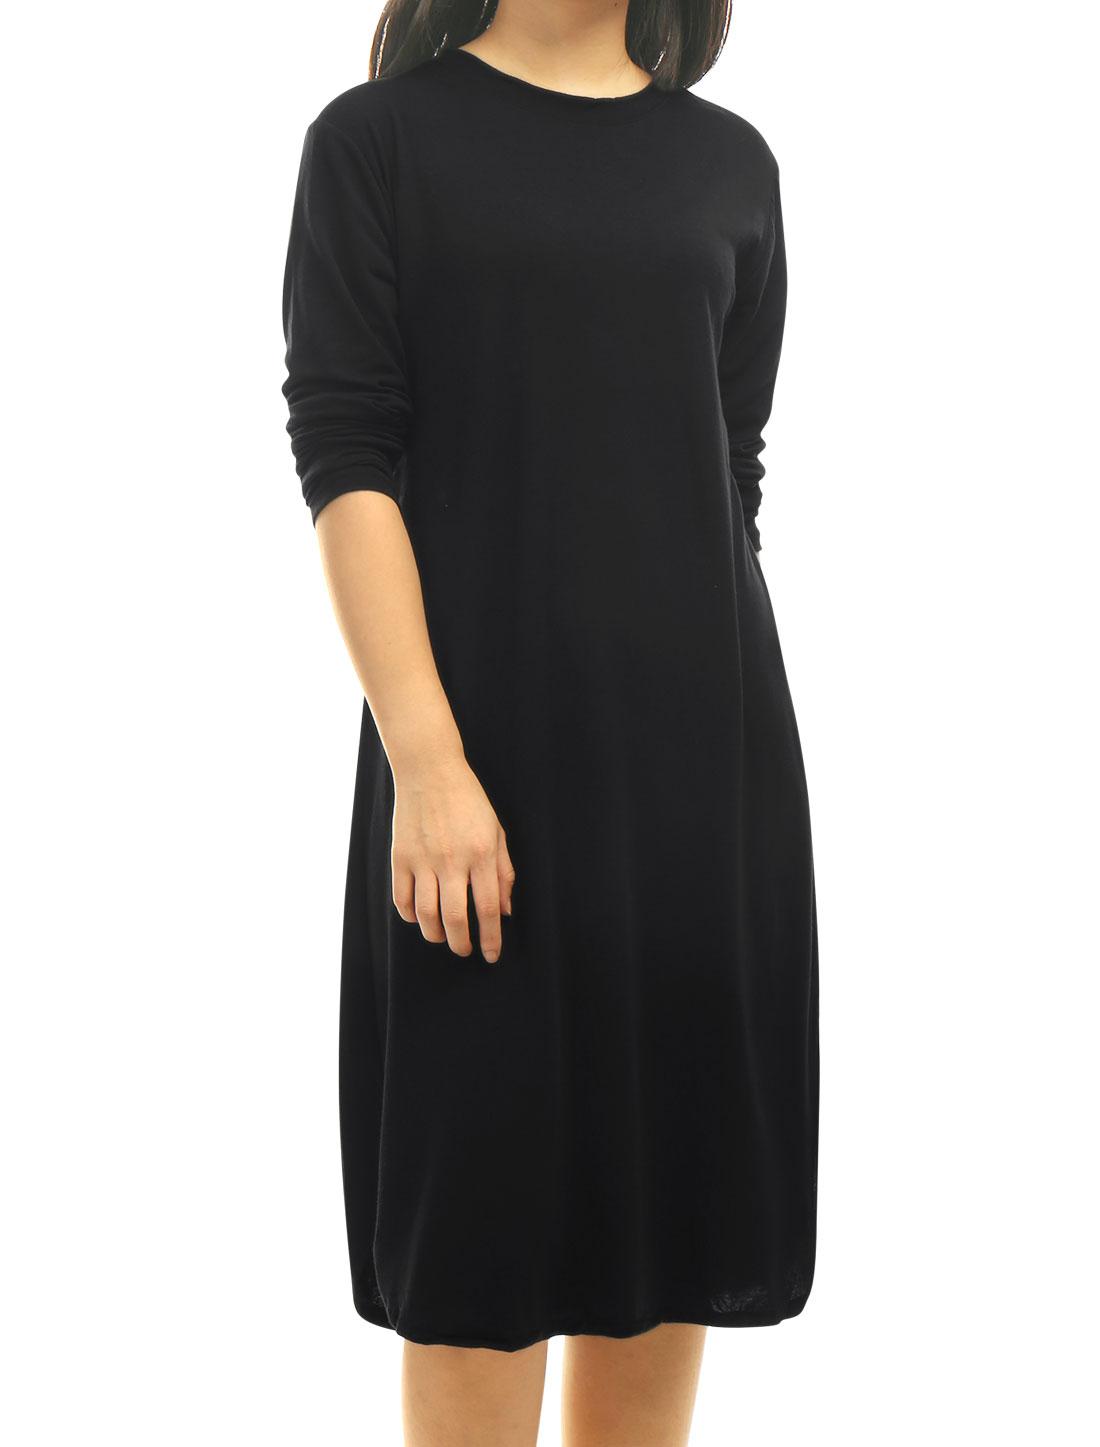 Women-Crew-Neck-Long-Sleeves-Split-Sides-Detail-Loose-Dress